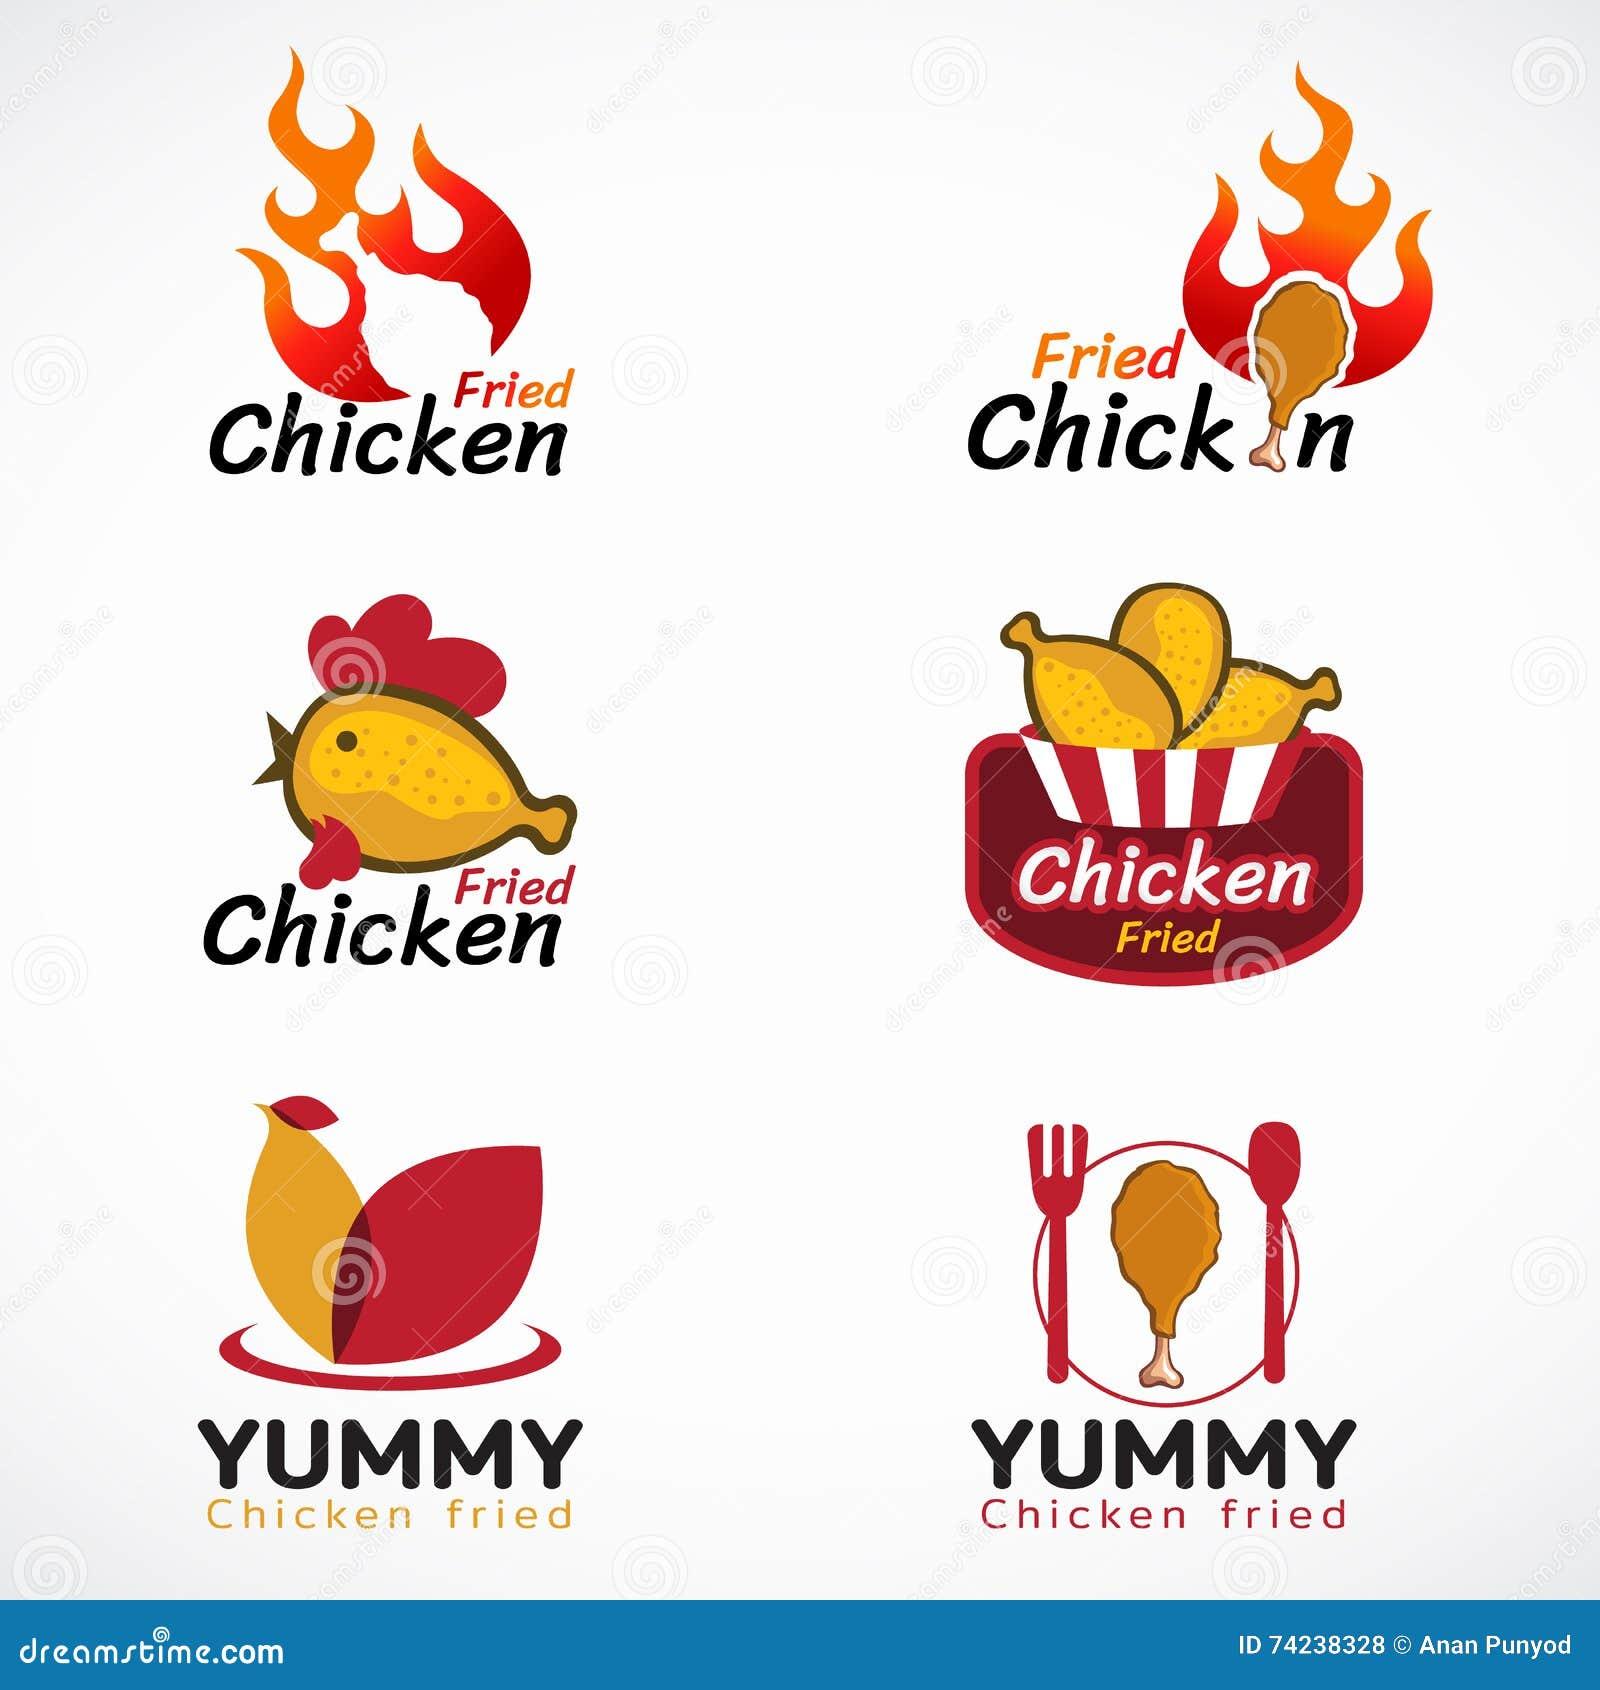 Fried chicken vector